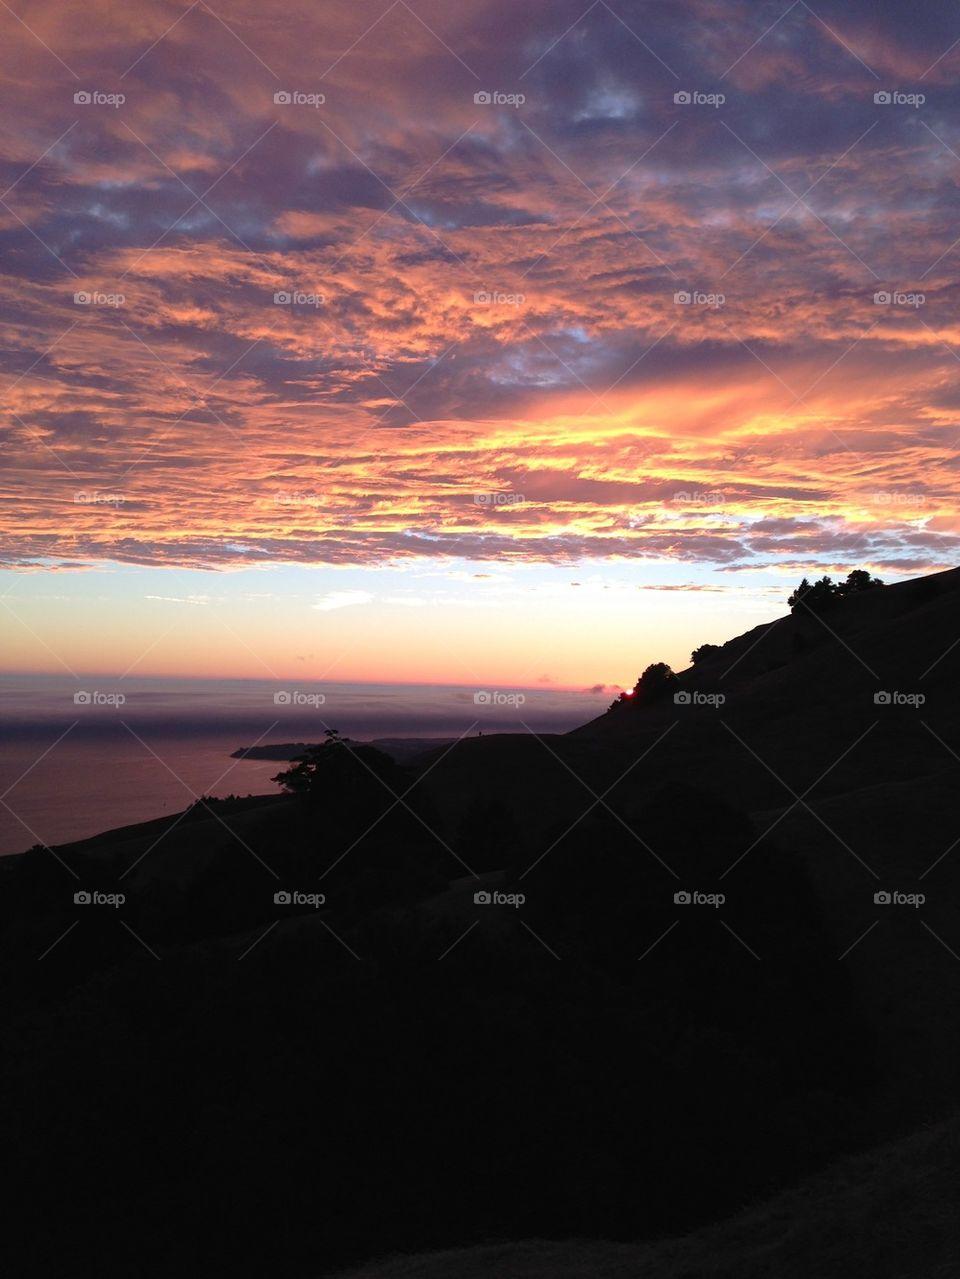 Sunset at Point Reyes